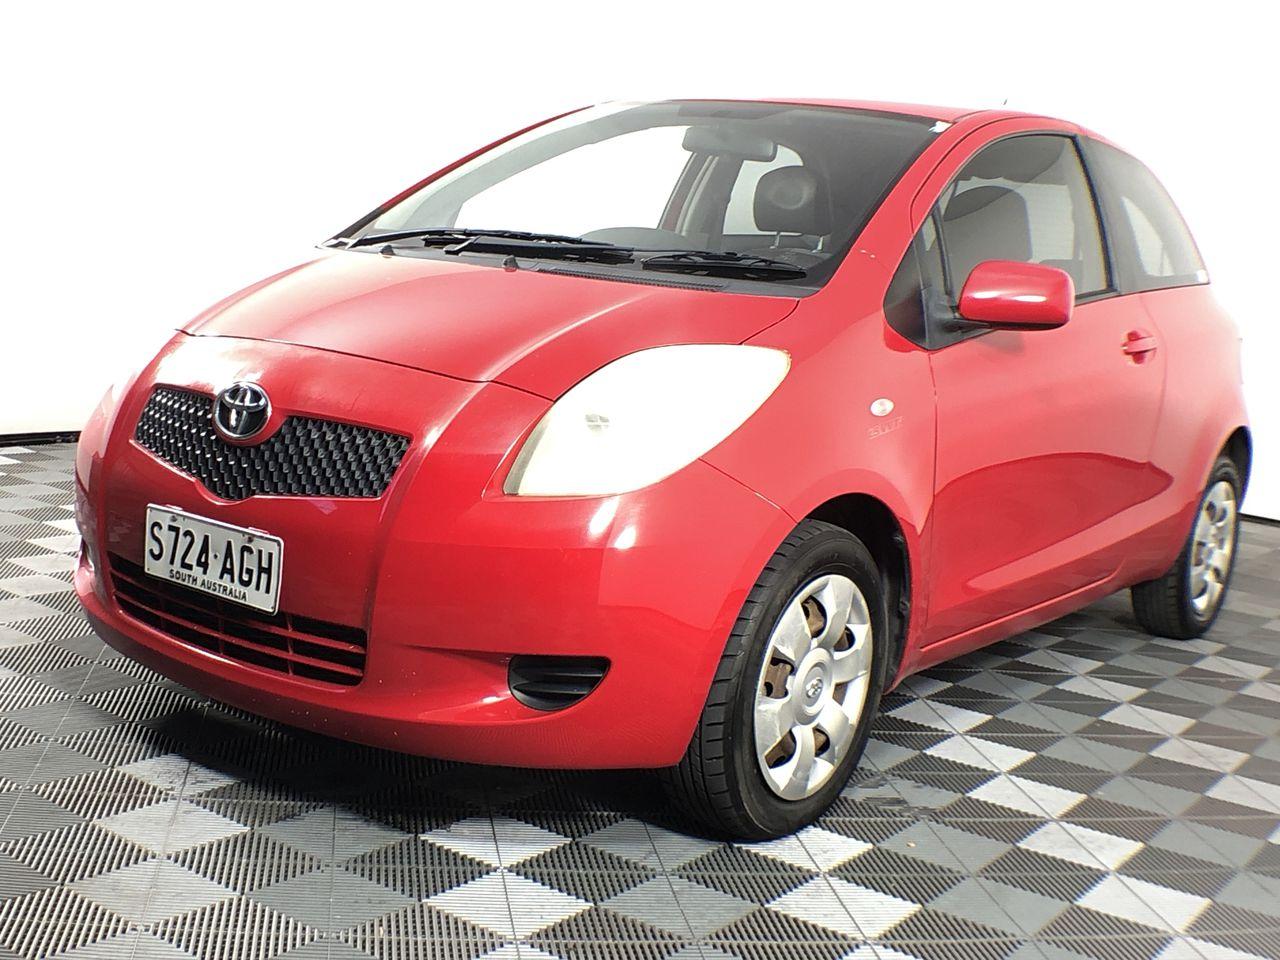 2008 Toyota Yaris YRS Manual Hatchback